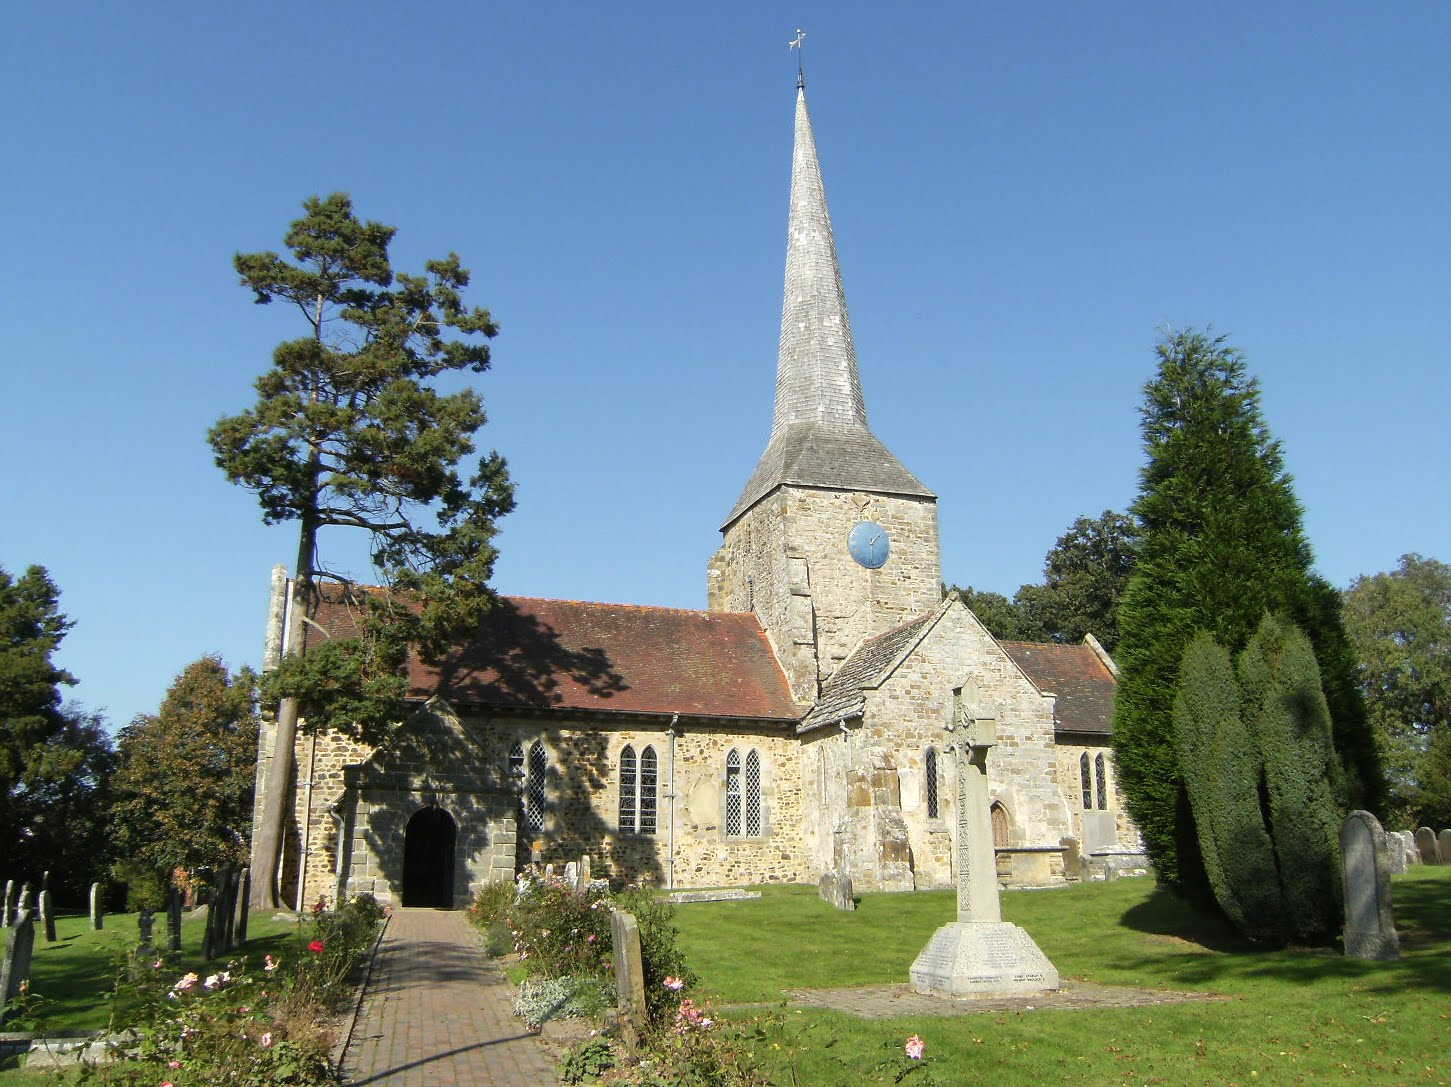 DSCF9759 St Giles church, Horsted Keynes